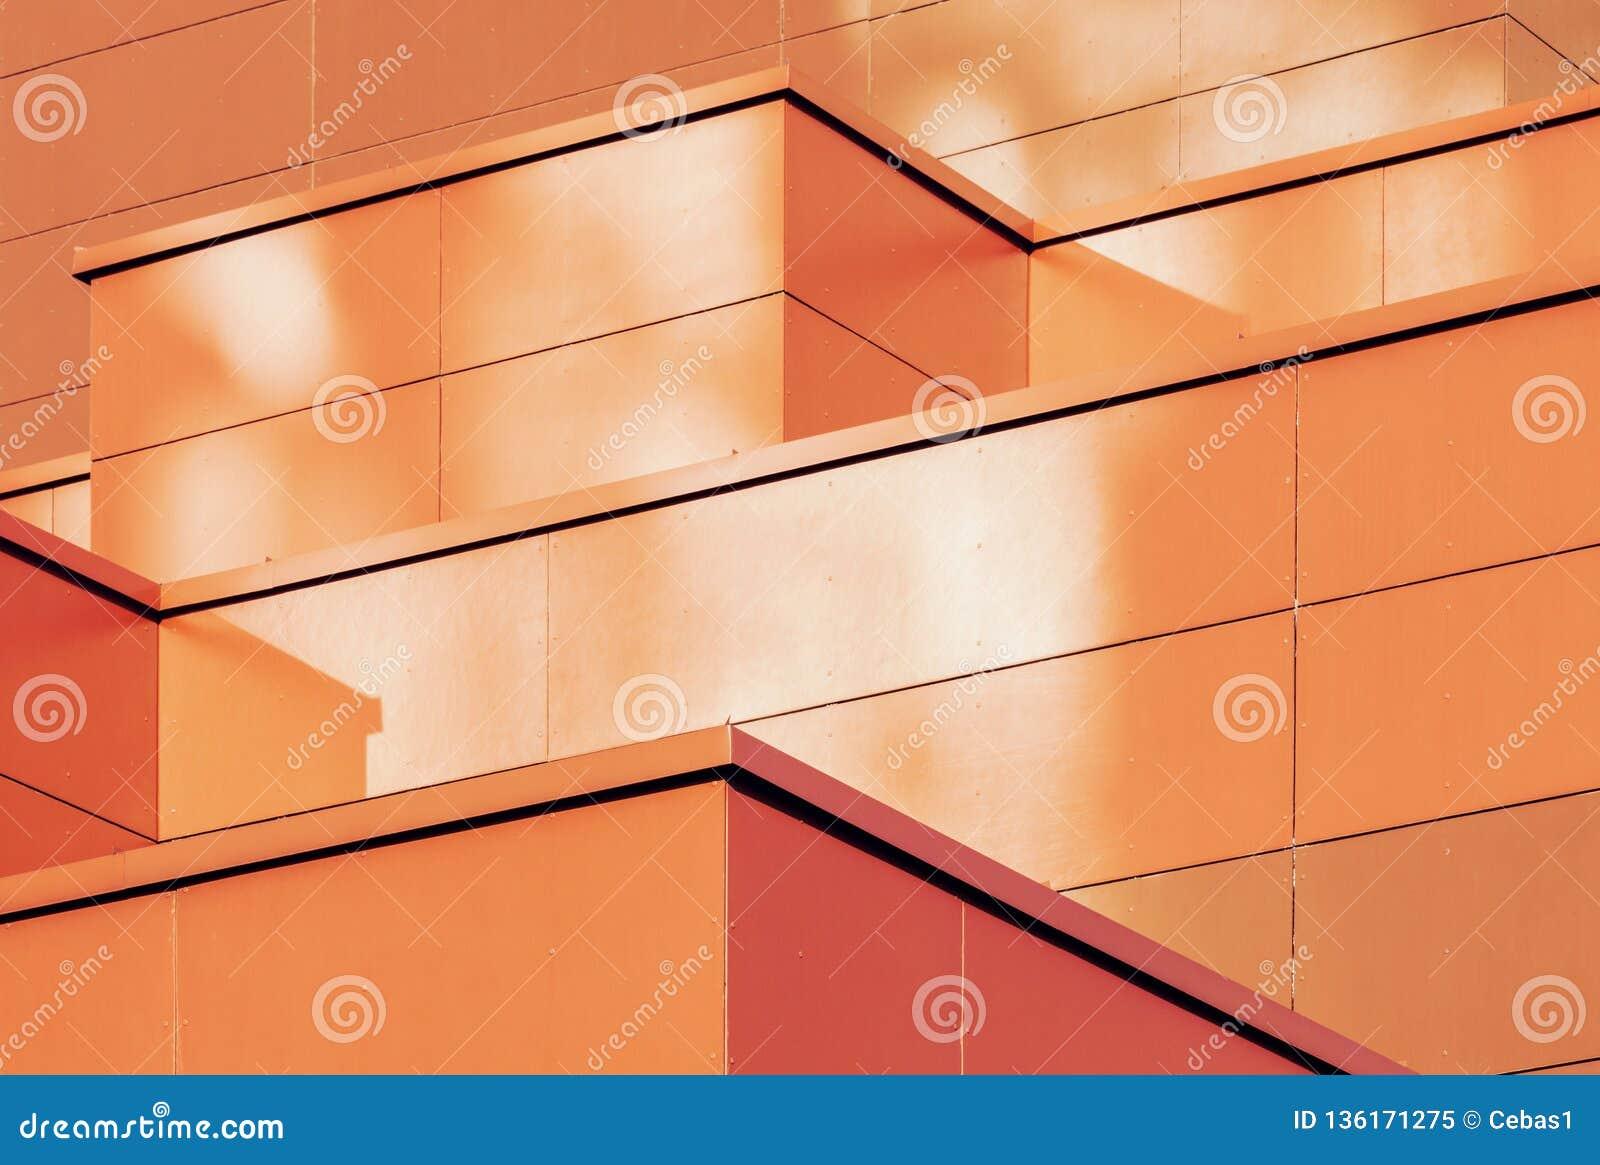 Orange colored geometric background of metal building facade